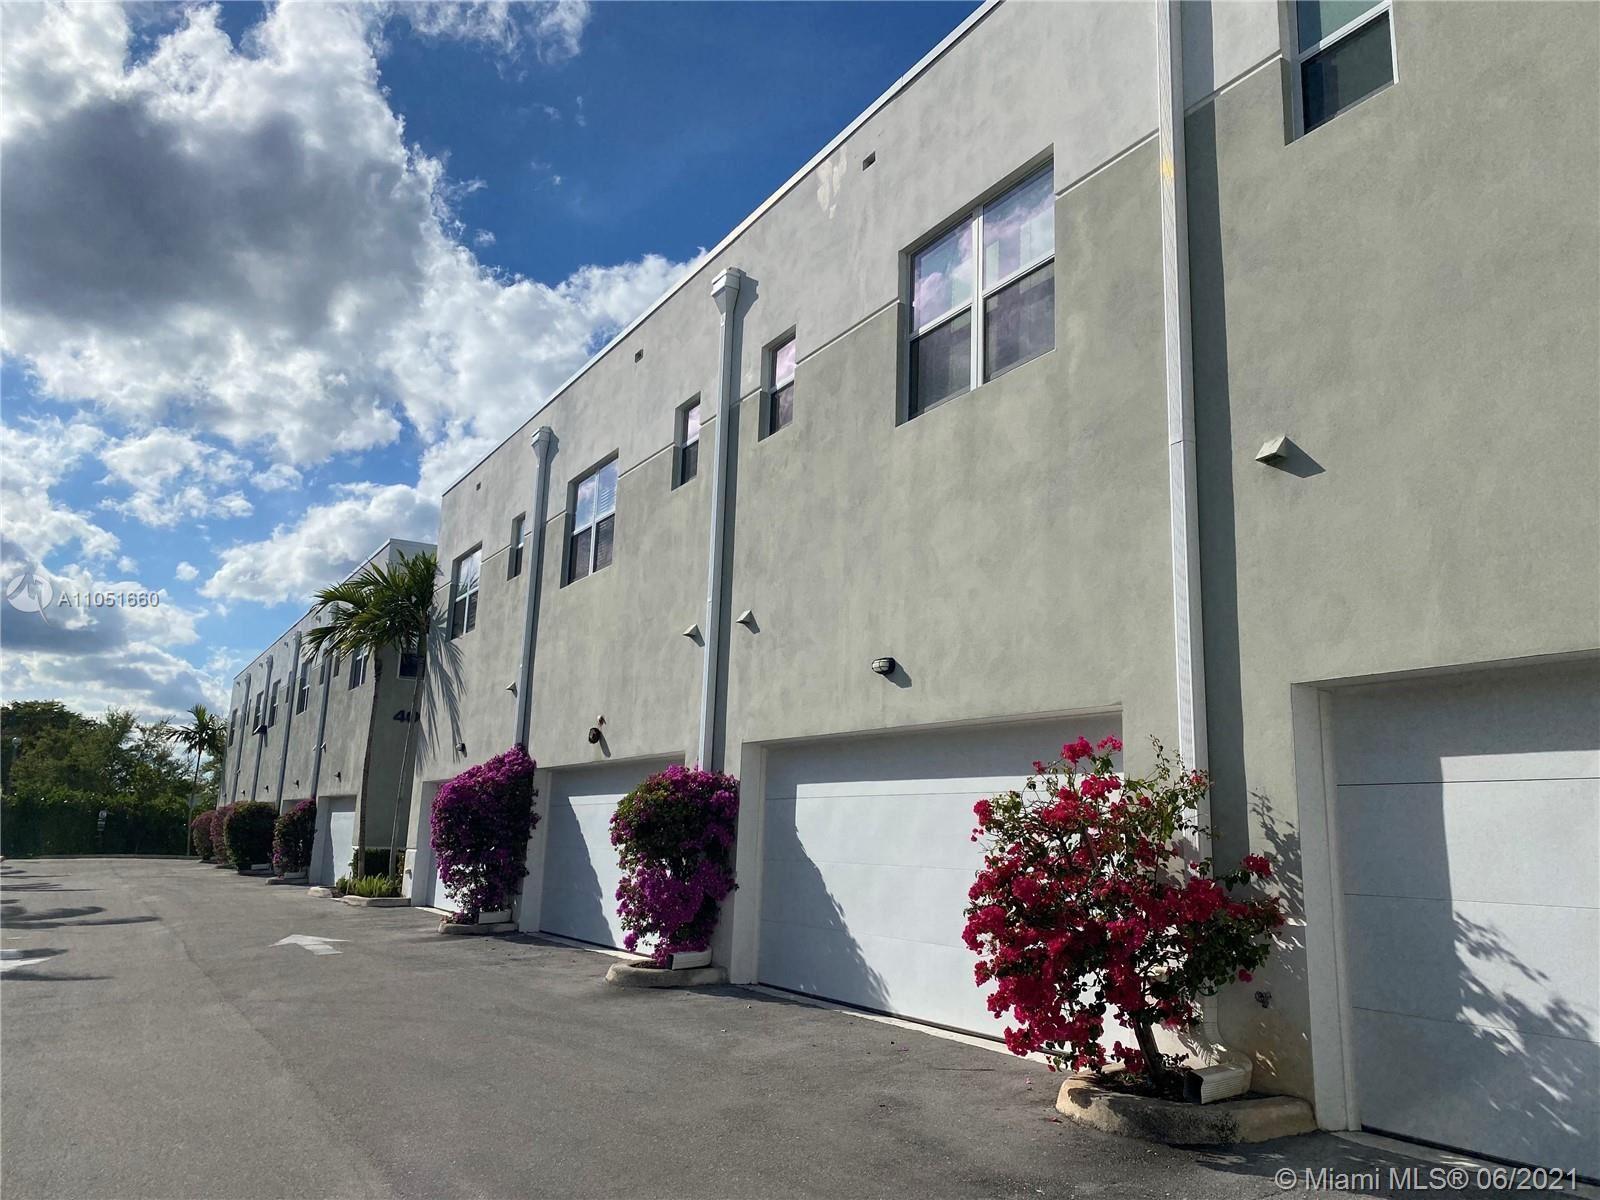 405 NE 35th Ct #2, Oakland Park, FL 33334 - #: A11051660